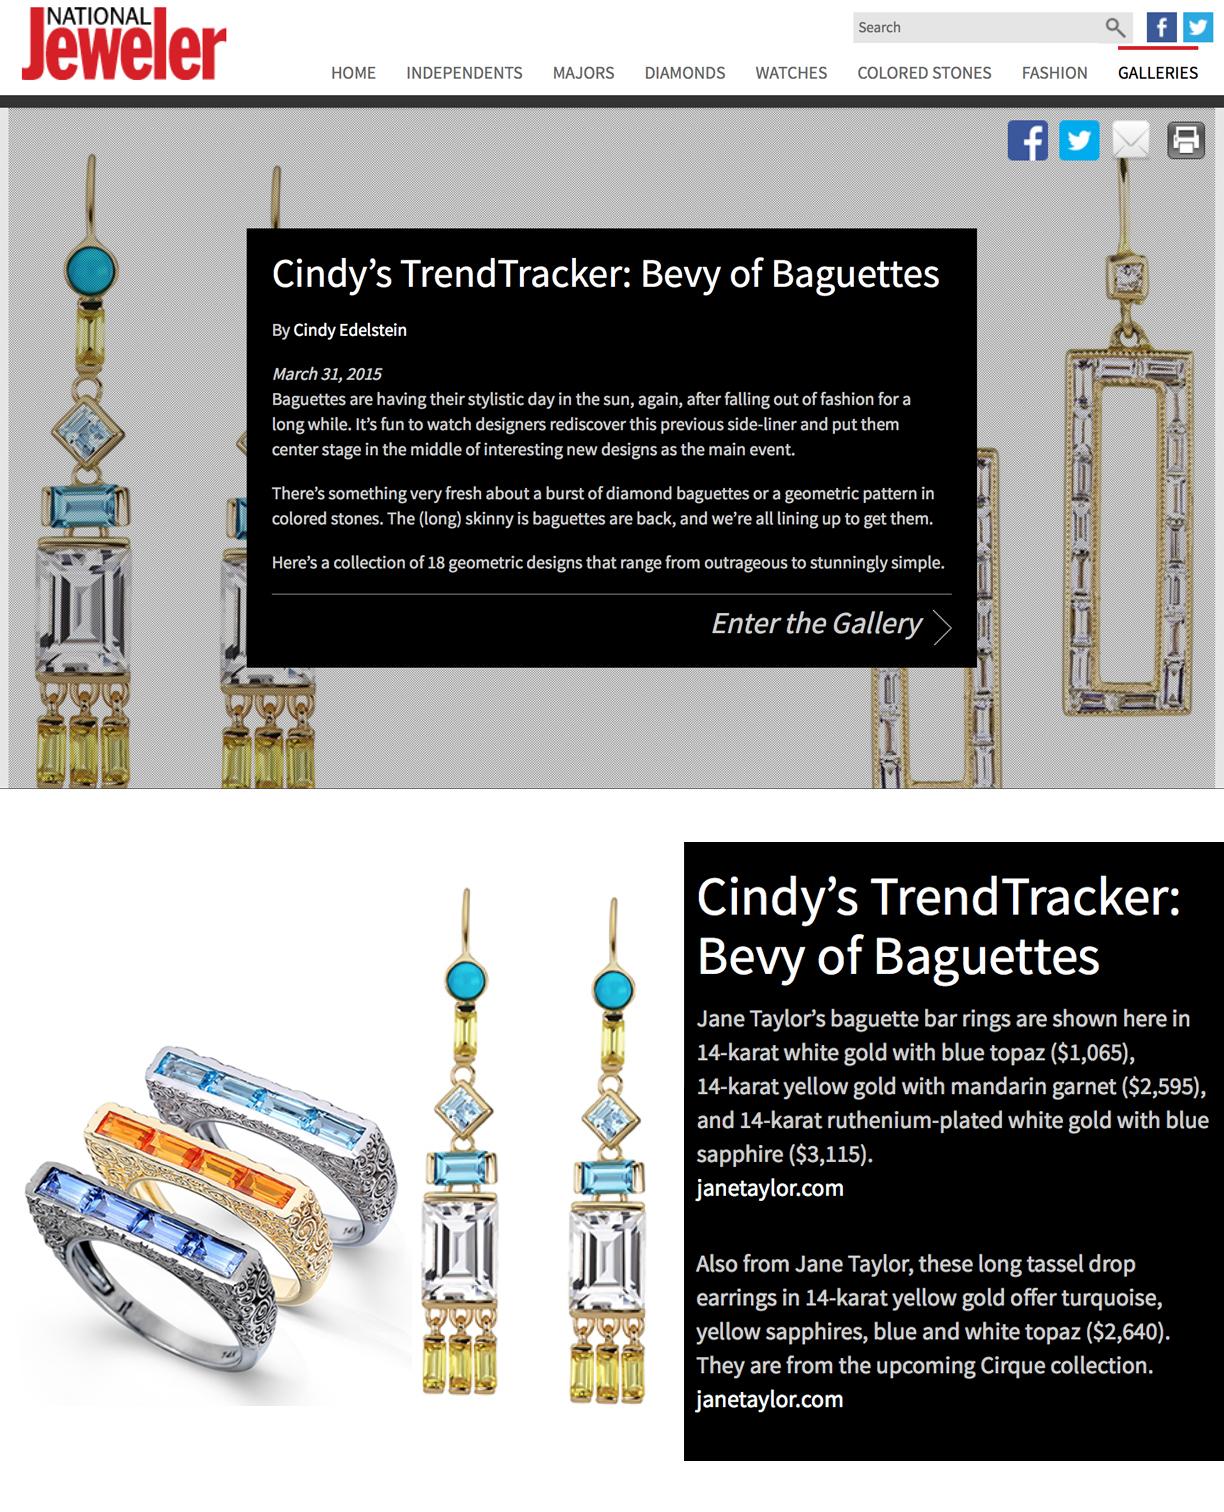 2015-3.31-National Jeweler.jpg